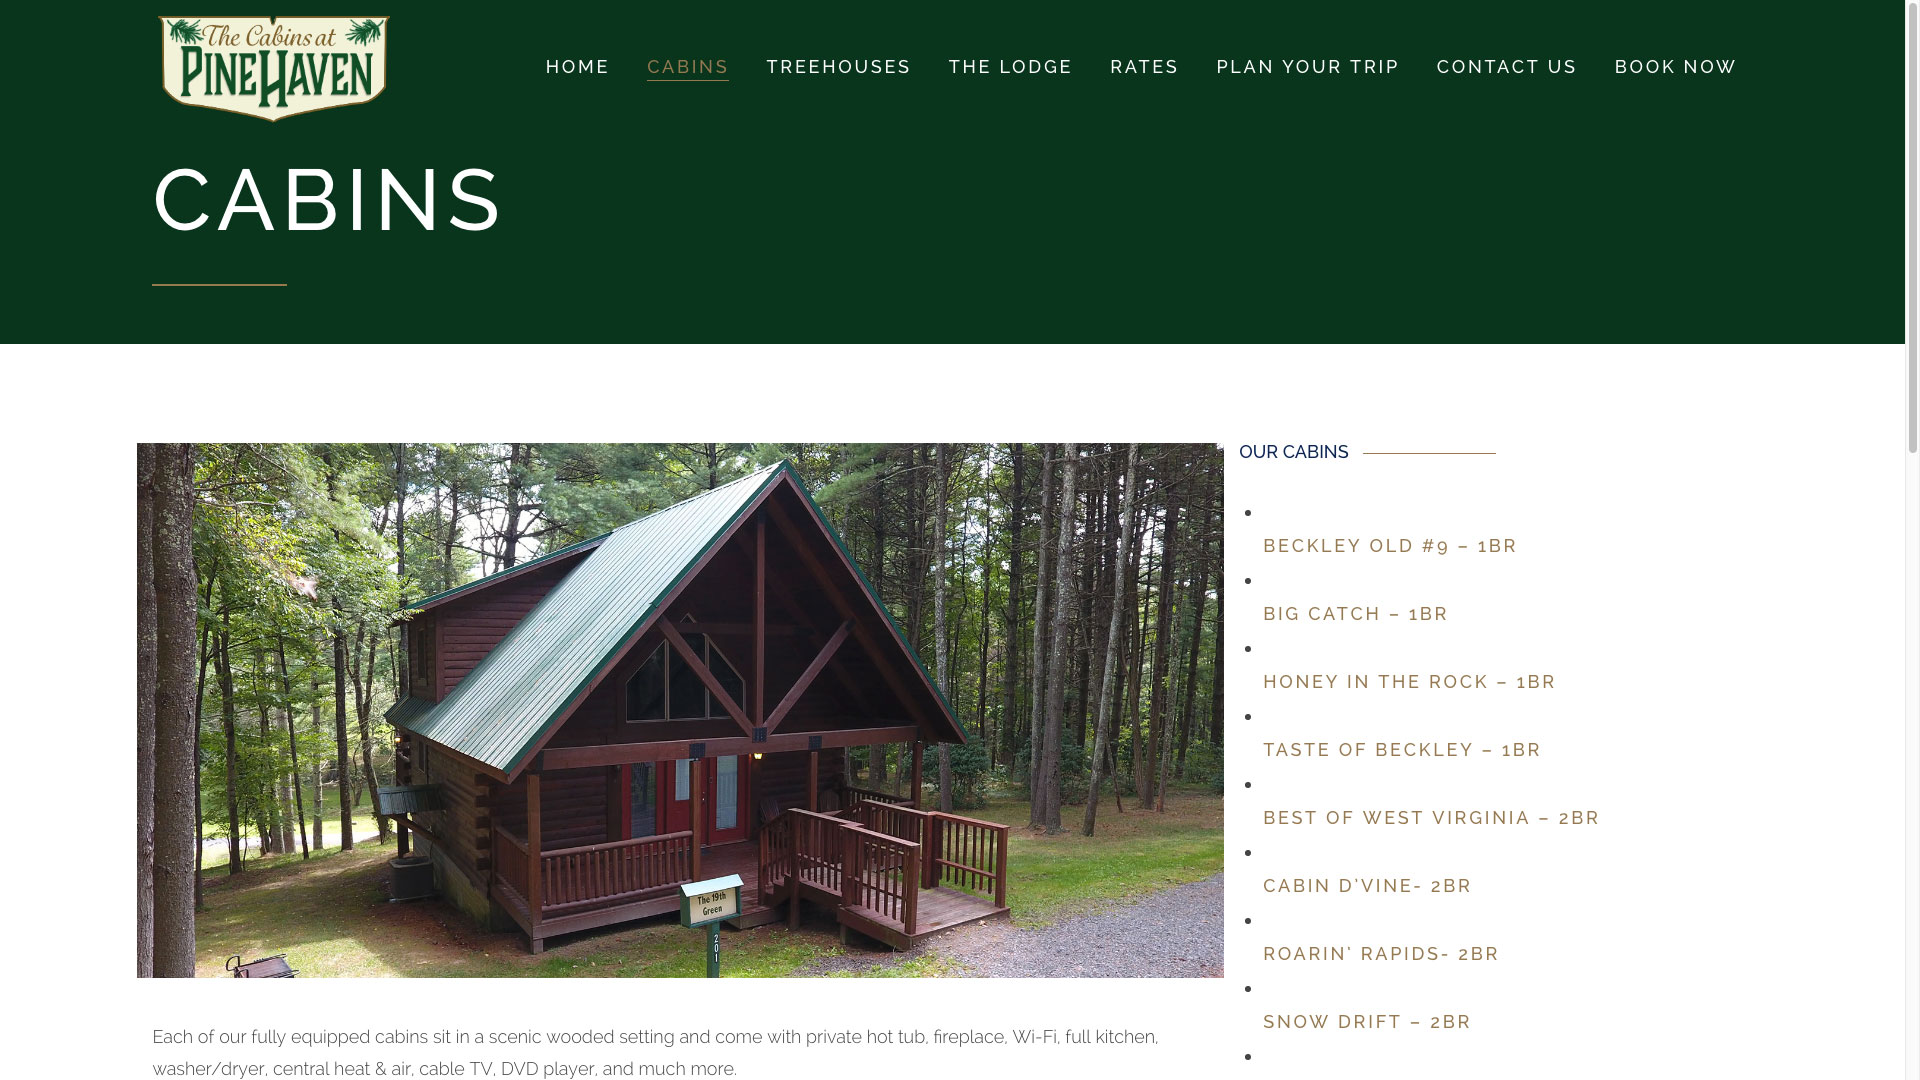 pinehaven-cabins-web-design